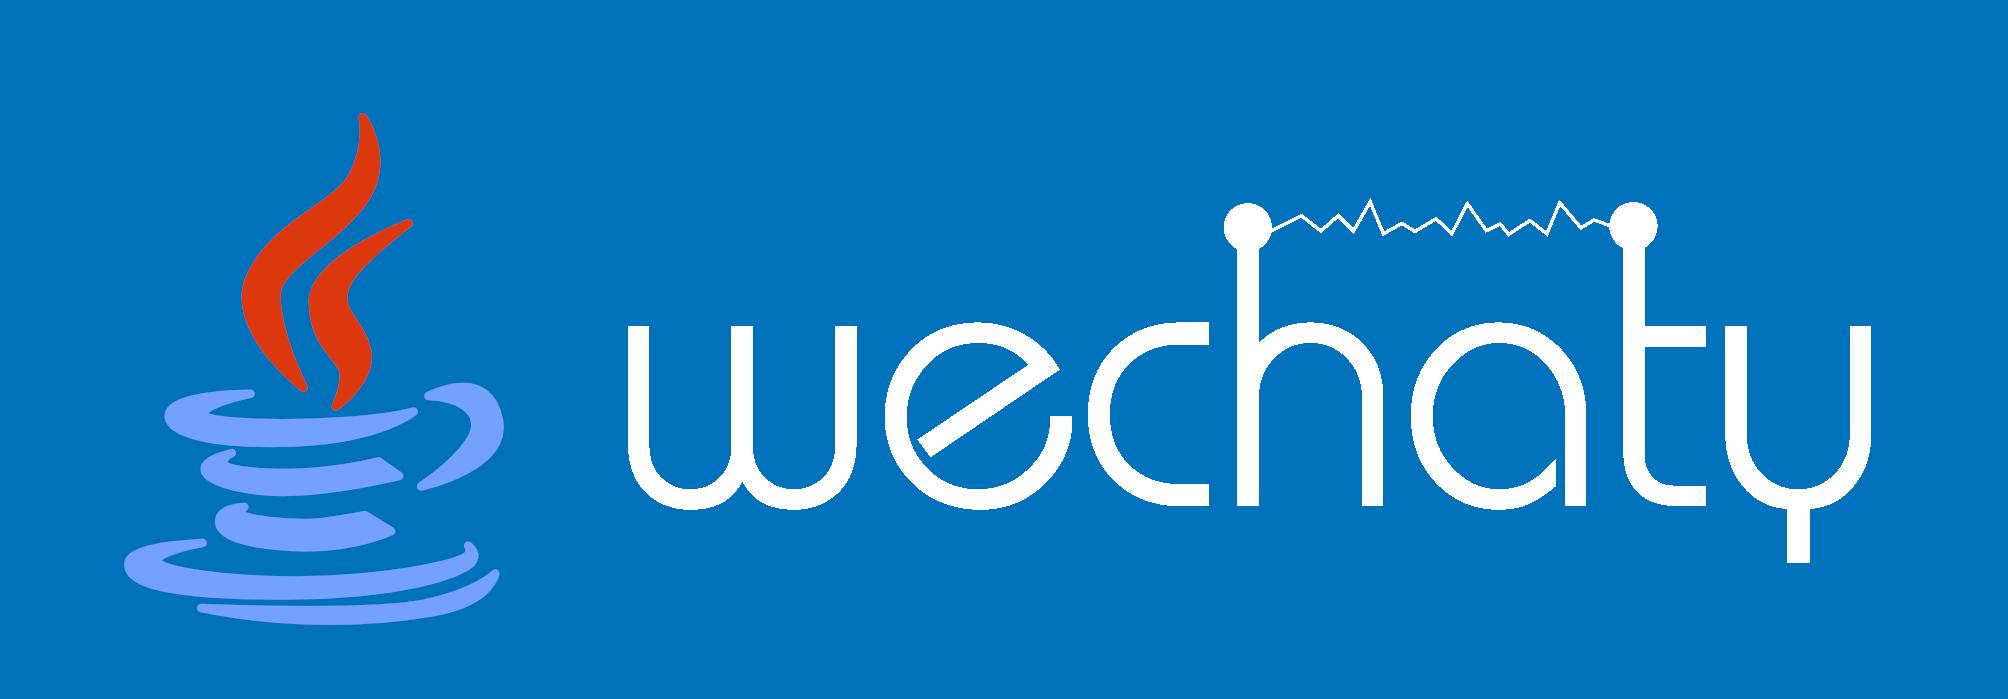 Java Wechaty